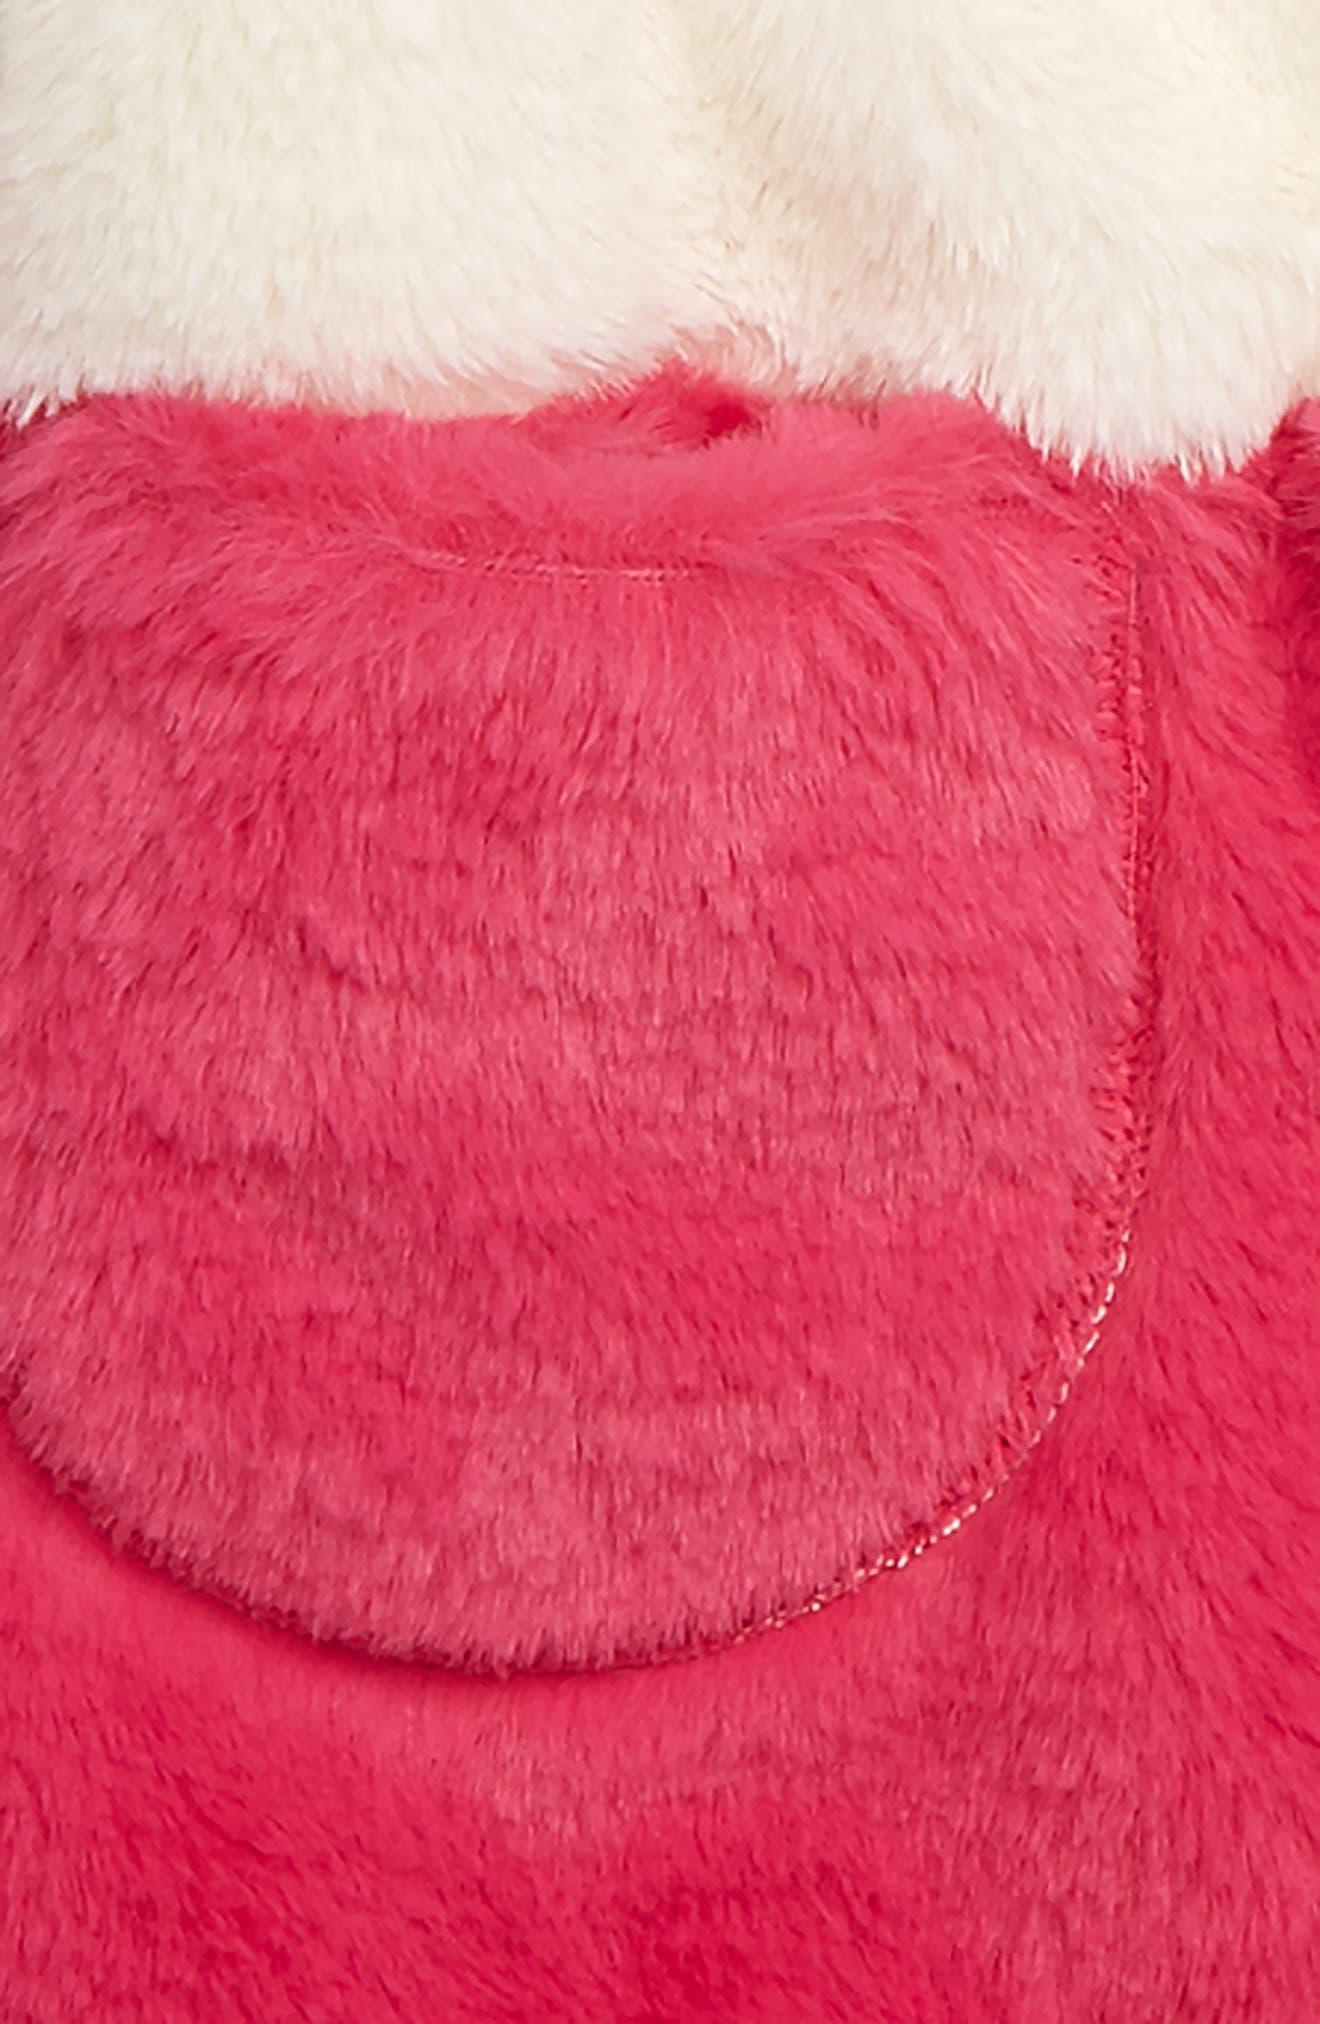 Coloblock Faux Fur Jacket,                             Alternate thumbnail 2, color,                             IVORY EGRET- PINK